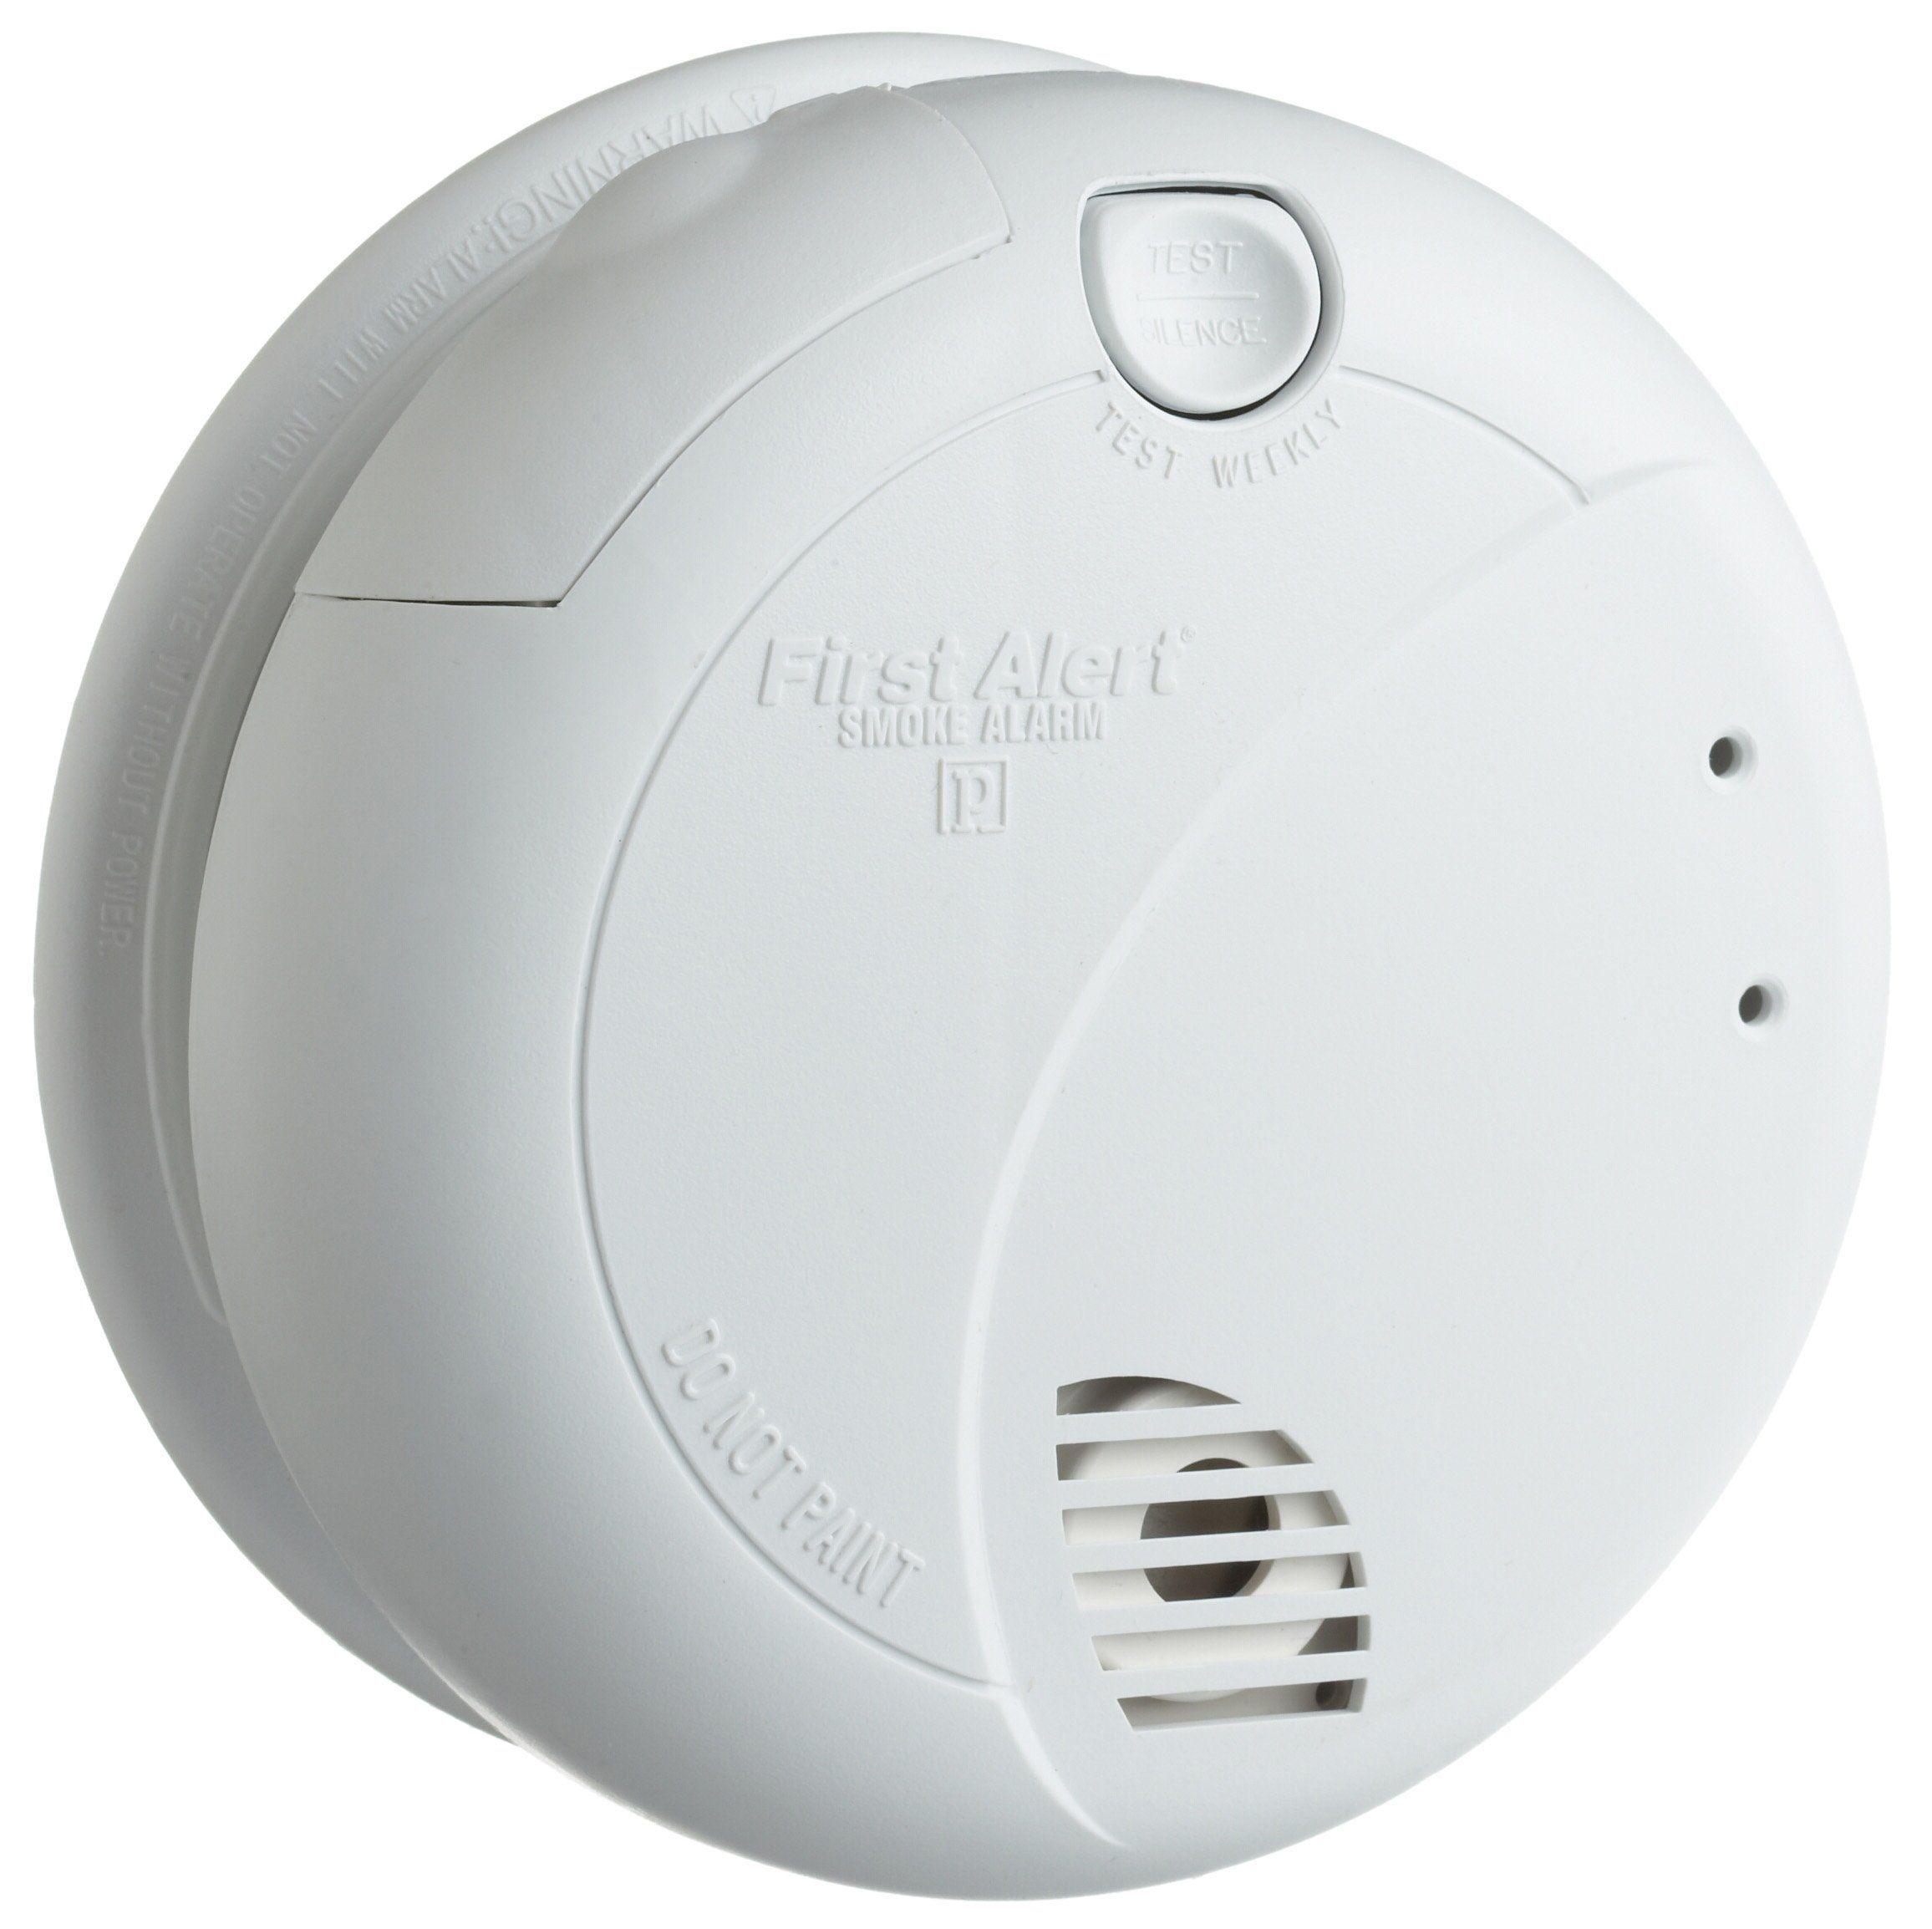 Brk Brands 7010b Hardwire Smoke Alarm With Photoelectric Sensor And Battery Backup Smoke Detectors Amazon In 2020 Smoke Alarms Photoelectric Sensor Battery Backup